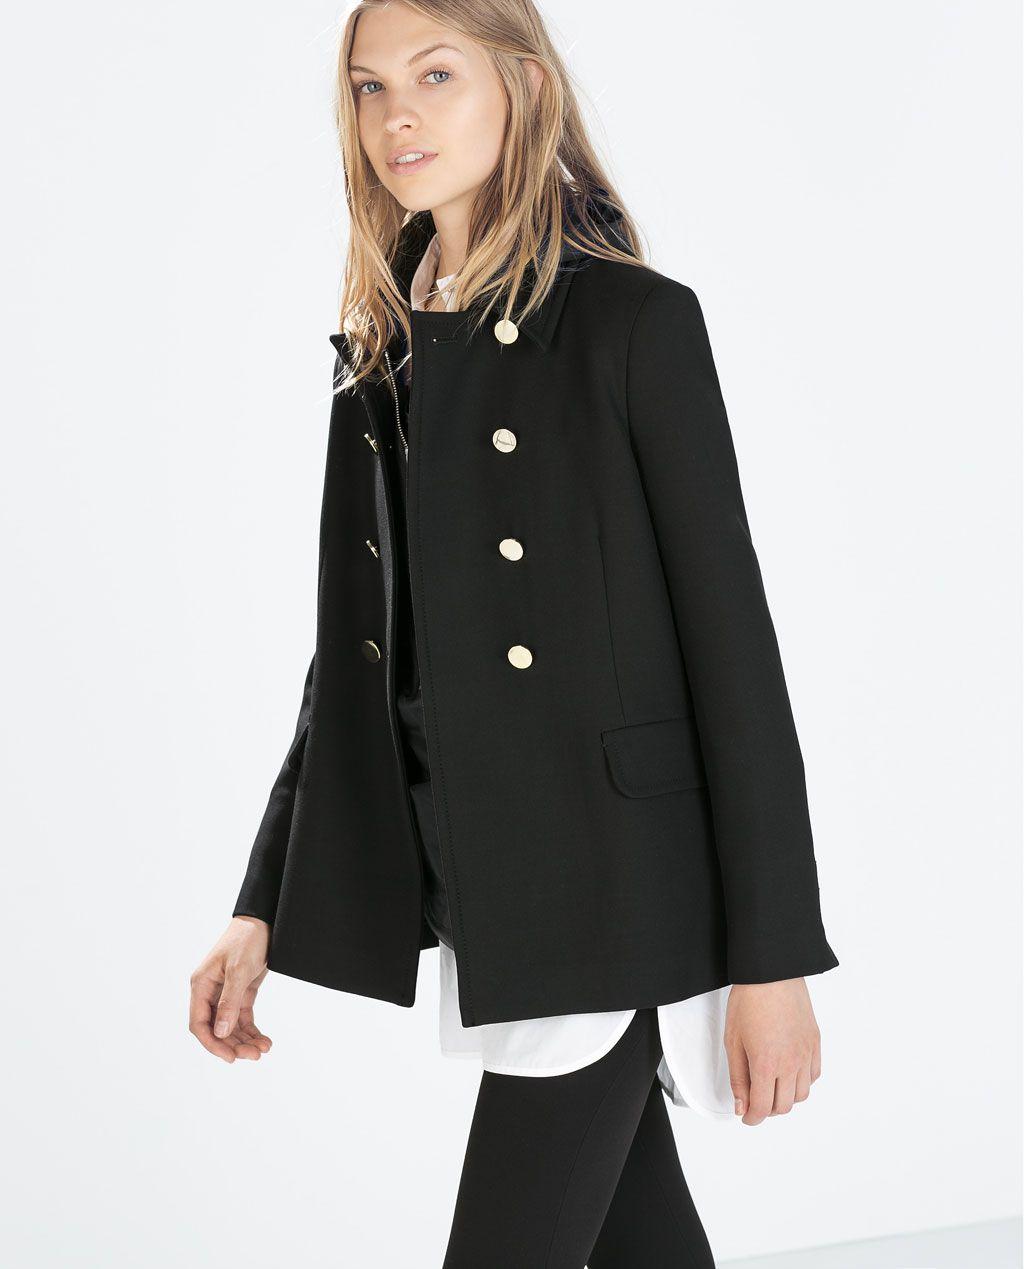 e5d30fa95ecbb Image 1 de CABAN DOUBLE RANGÉE DE BOUTONS de Zara   Fashion   WOMEN ...